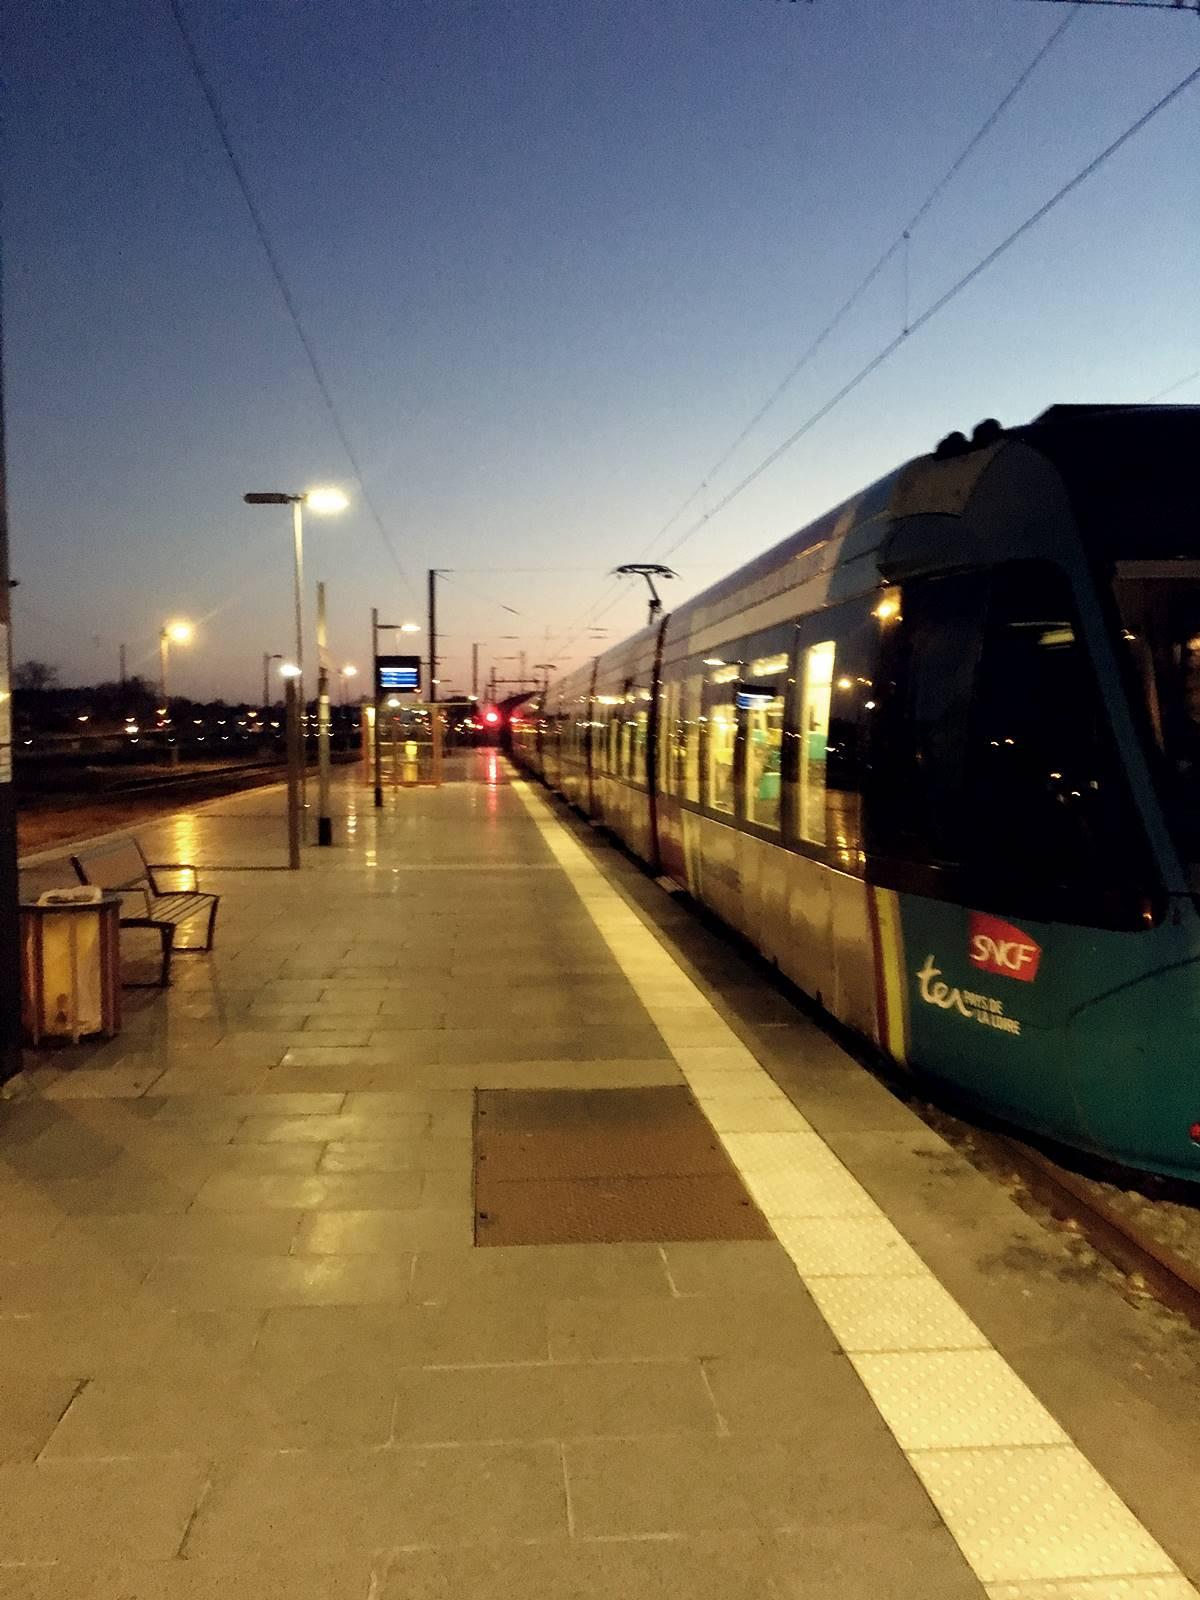 Teste tram train chateaubriant nantes 1